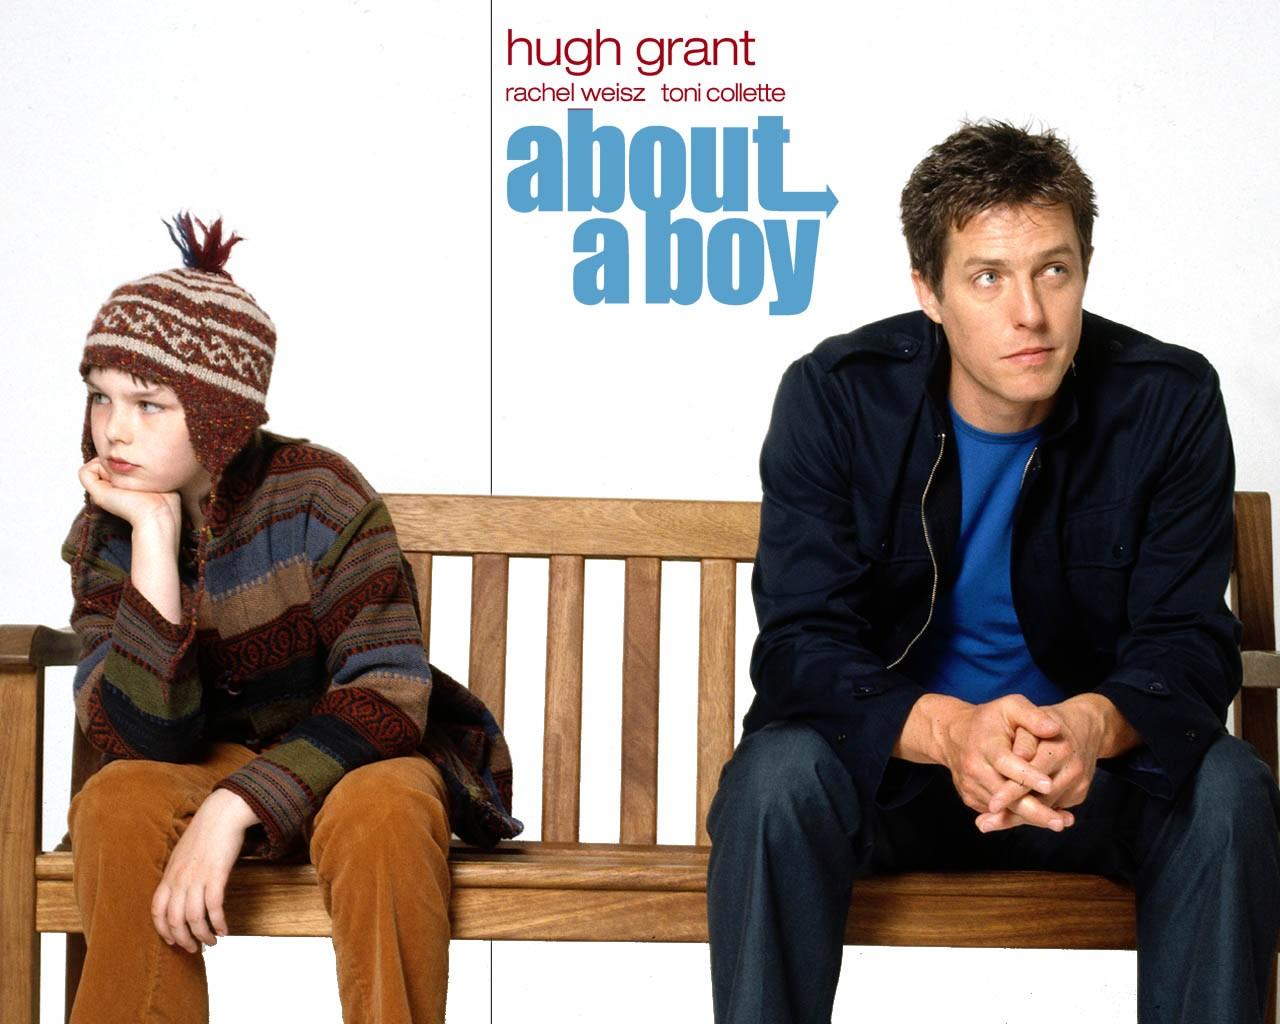 Wallpaper del film con i due protagonisti, Hugh Grant e Nicholas Hoult.